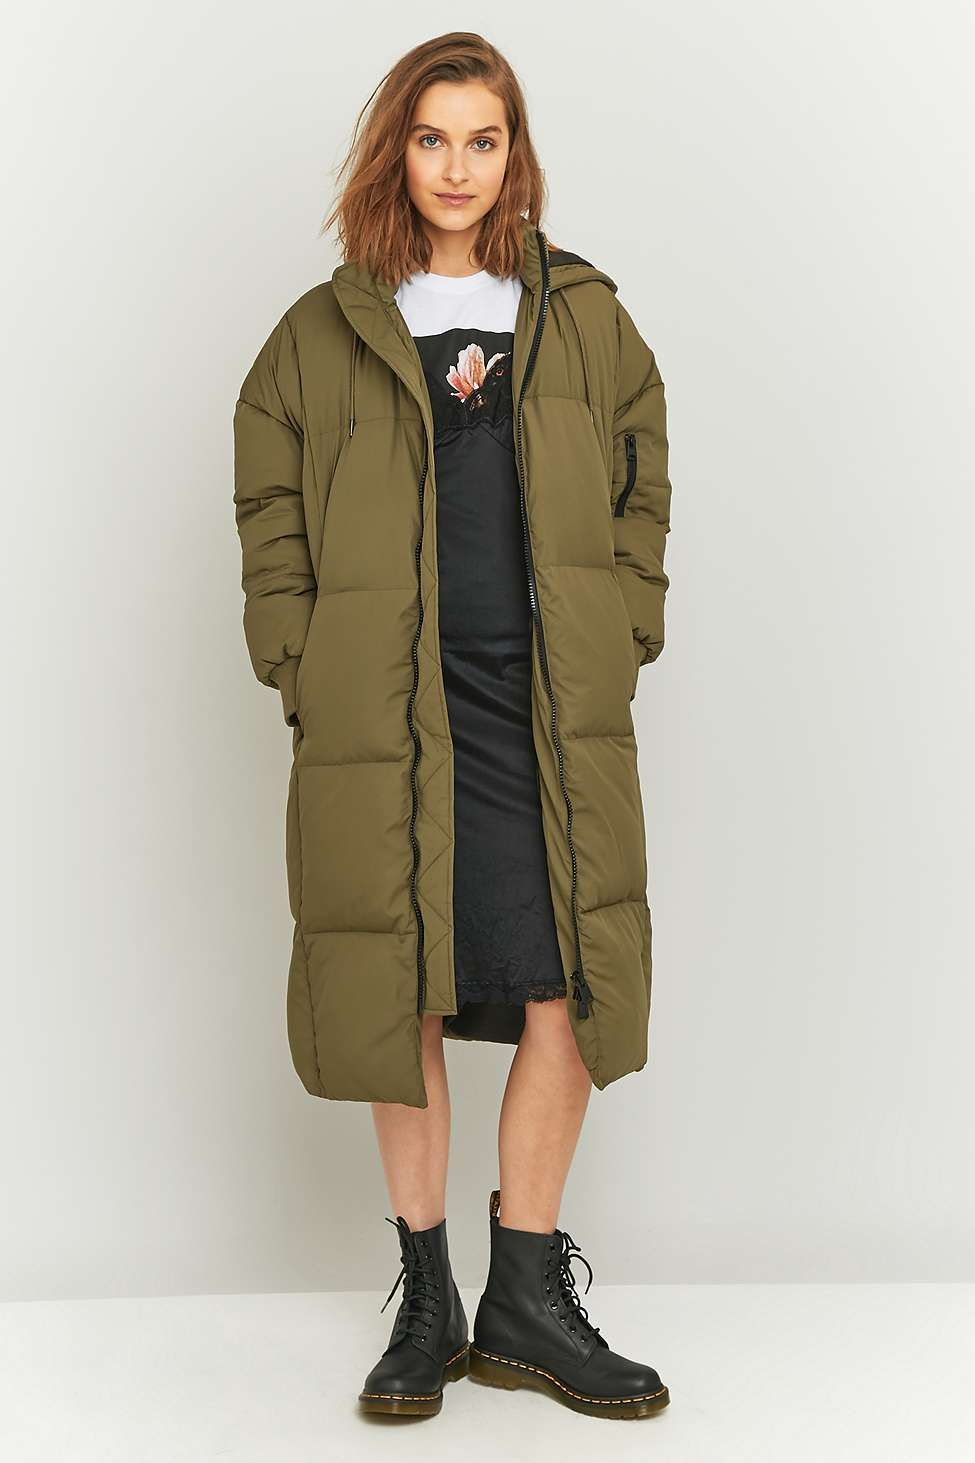 Sweatwater Mens Hooded Winter Puffer Zip Up Overcoat Parka Jackets Coat